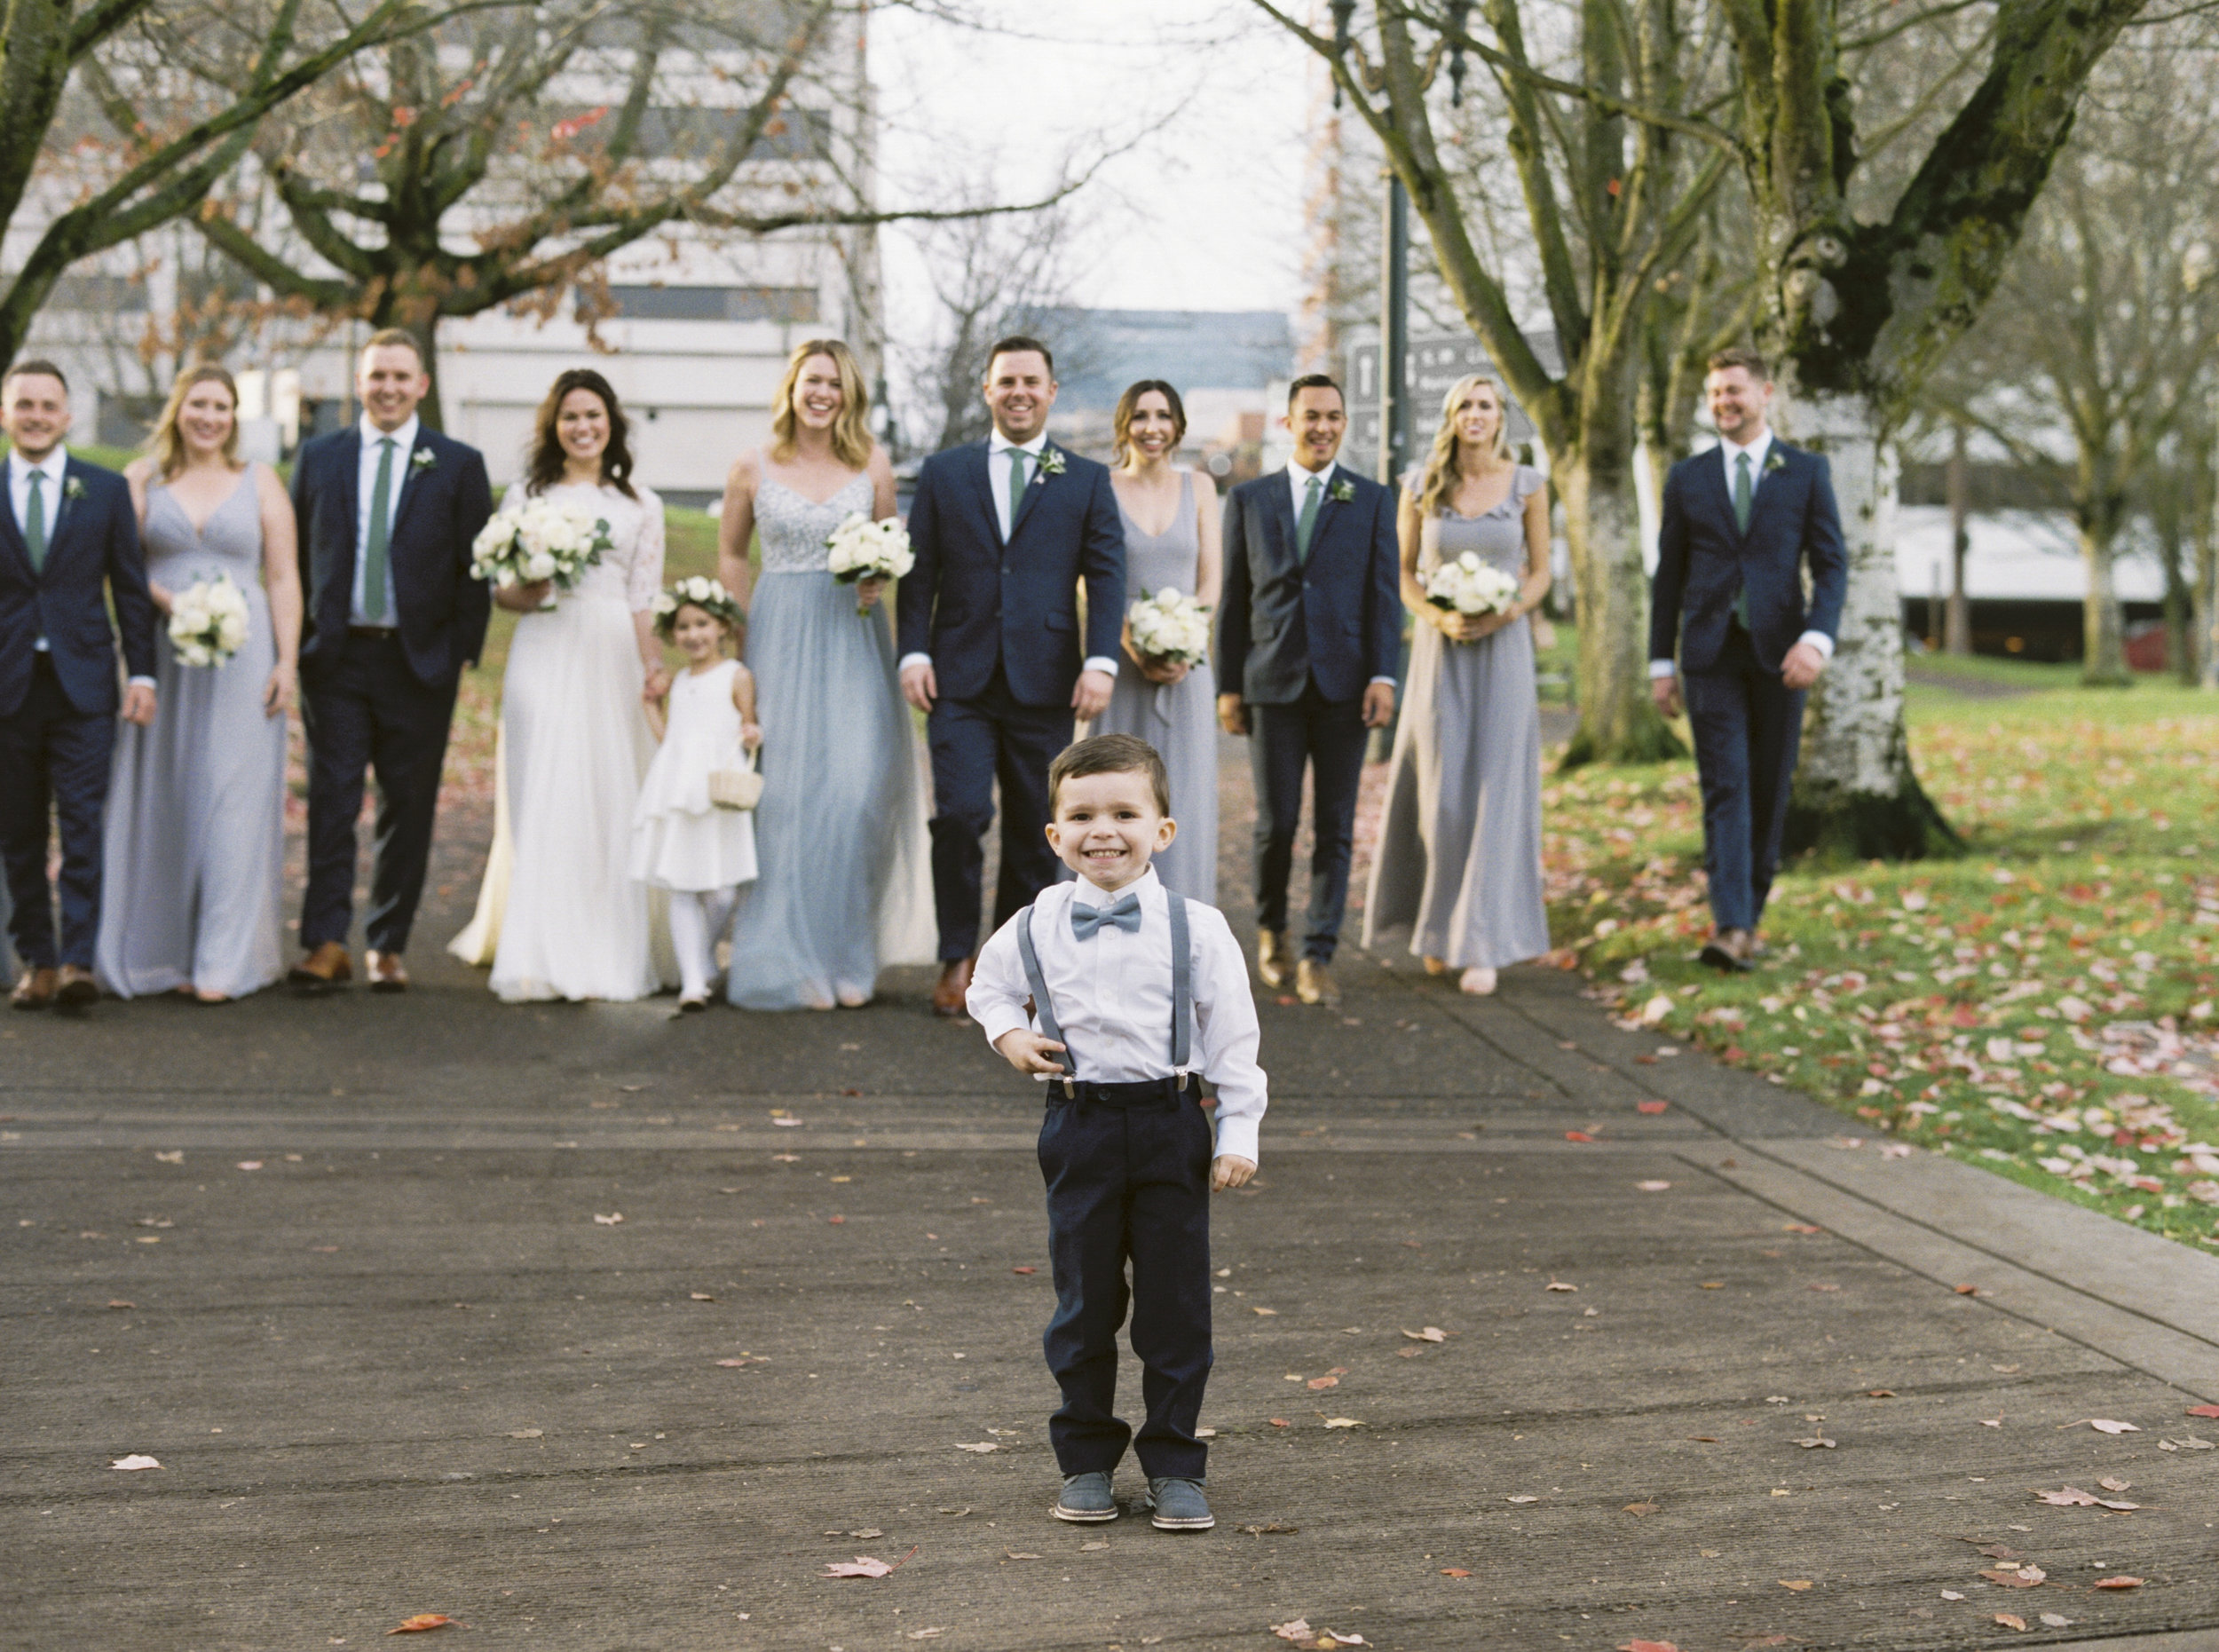 Castaway_Wedding_Photographer_Samantha&Garrett_159.jpg